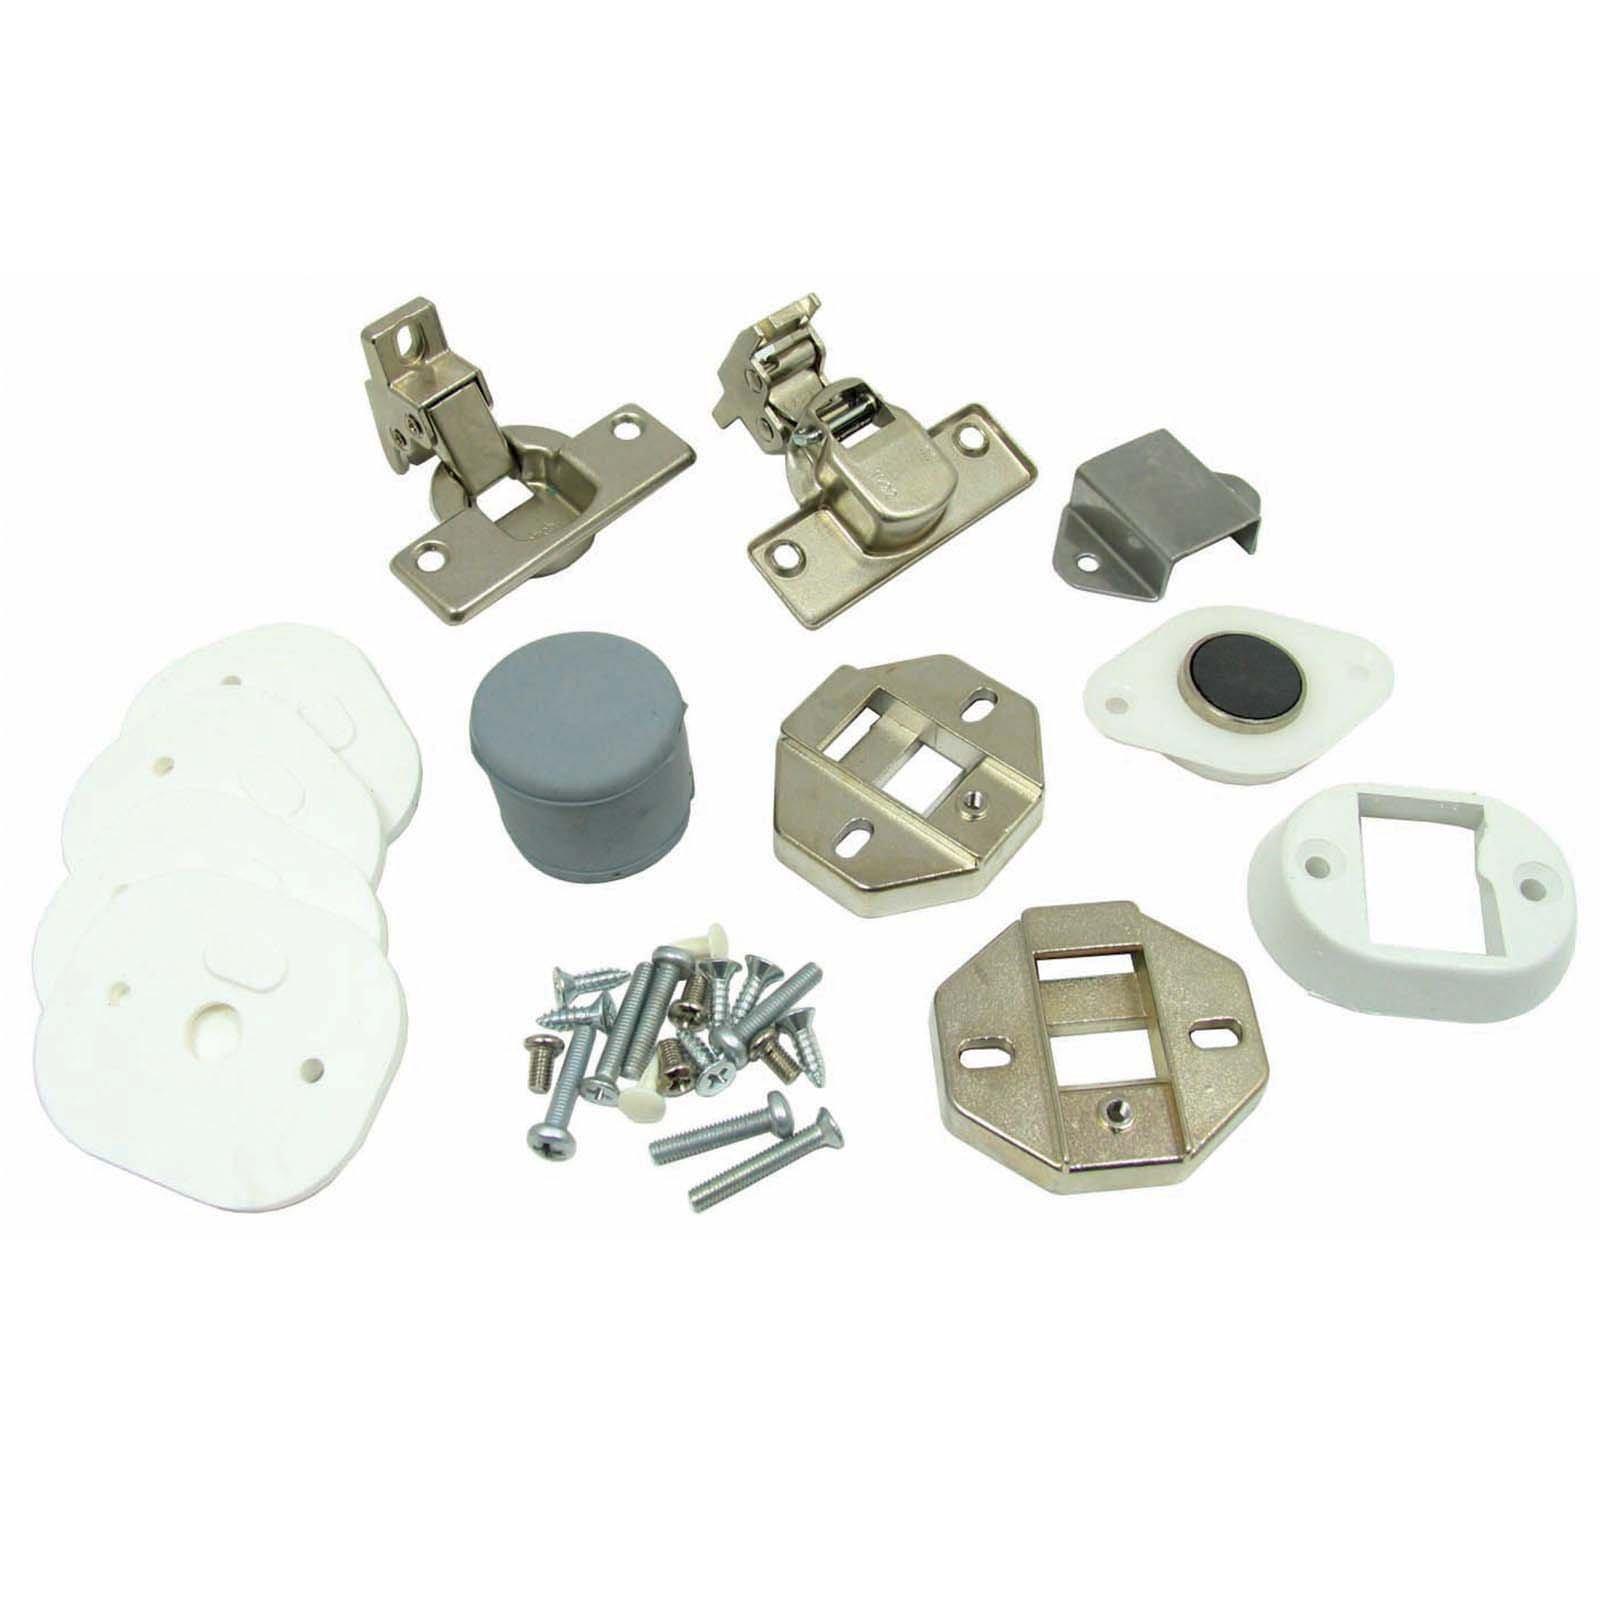 Ariston CD12TUK CDE12XUK LBE12XUK Washing Machine Cupboard Door Decor Hinge Installation Kit